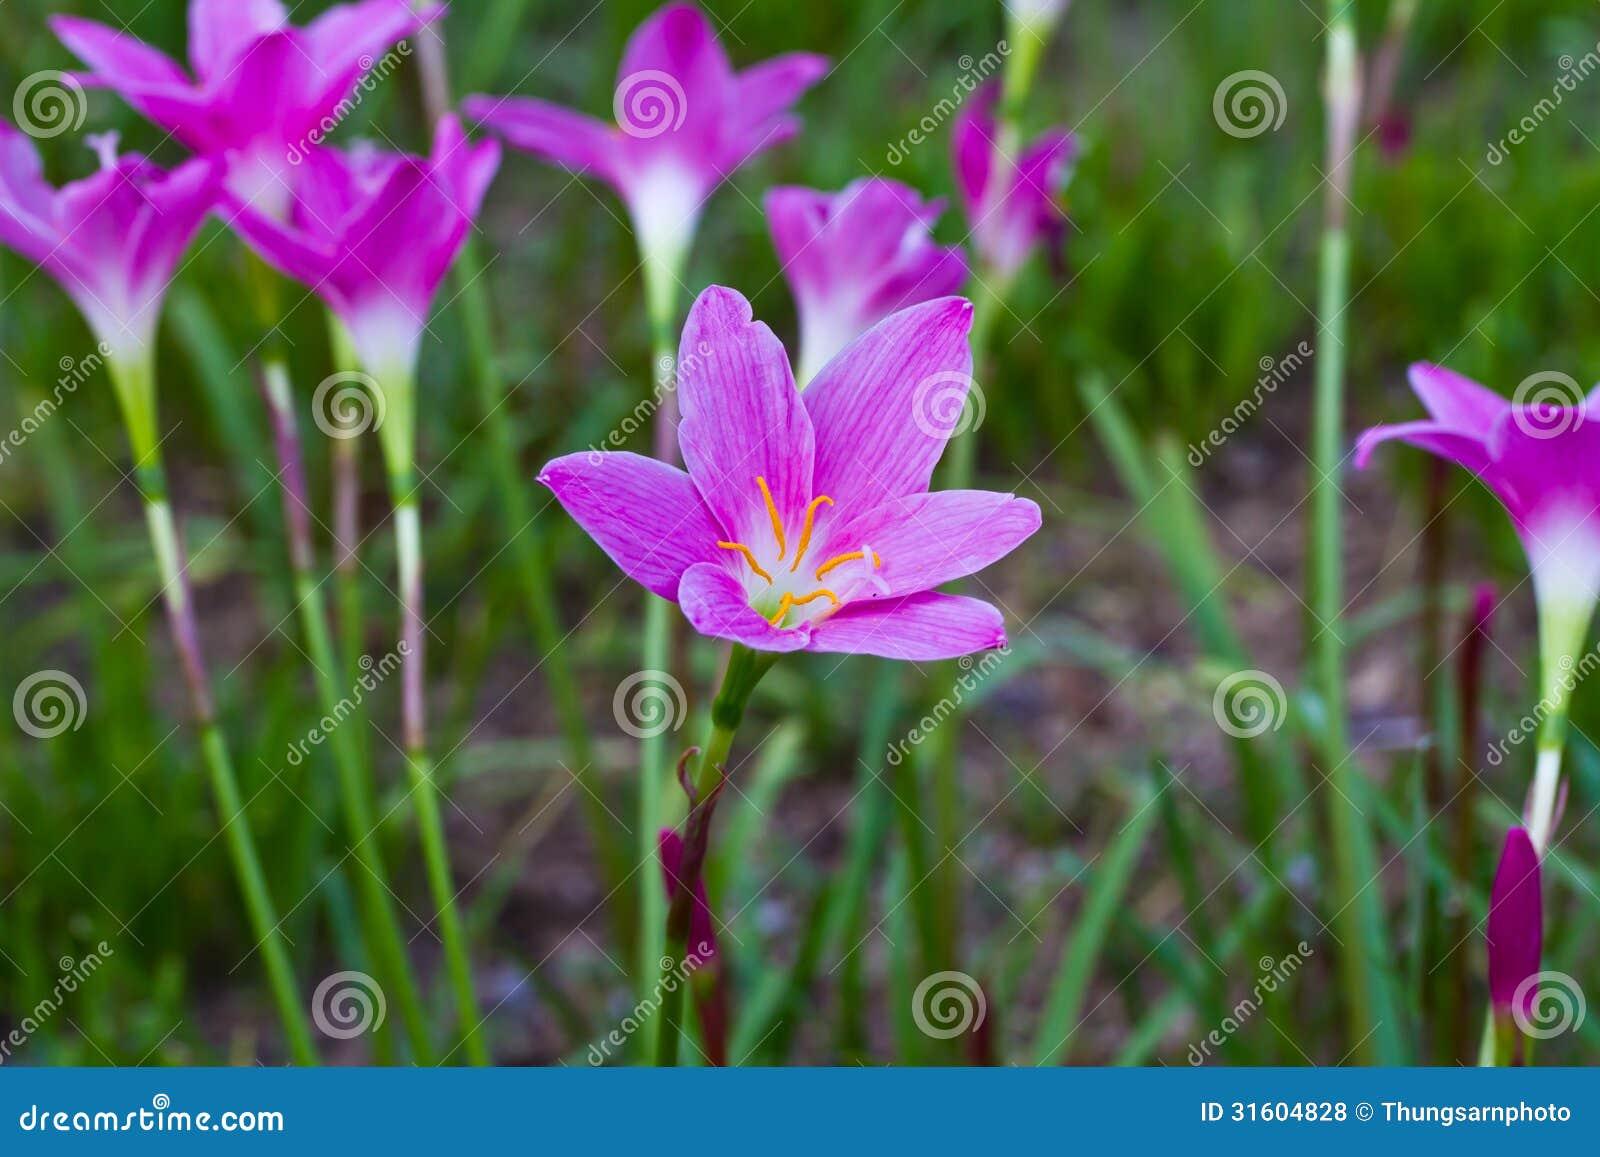 Beautiful purple rain lily flowers stock photo image of plant royalty free stock photo izmirmasajfo Gallery